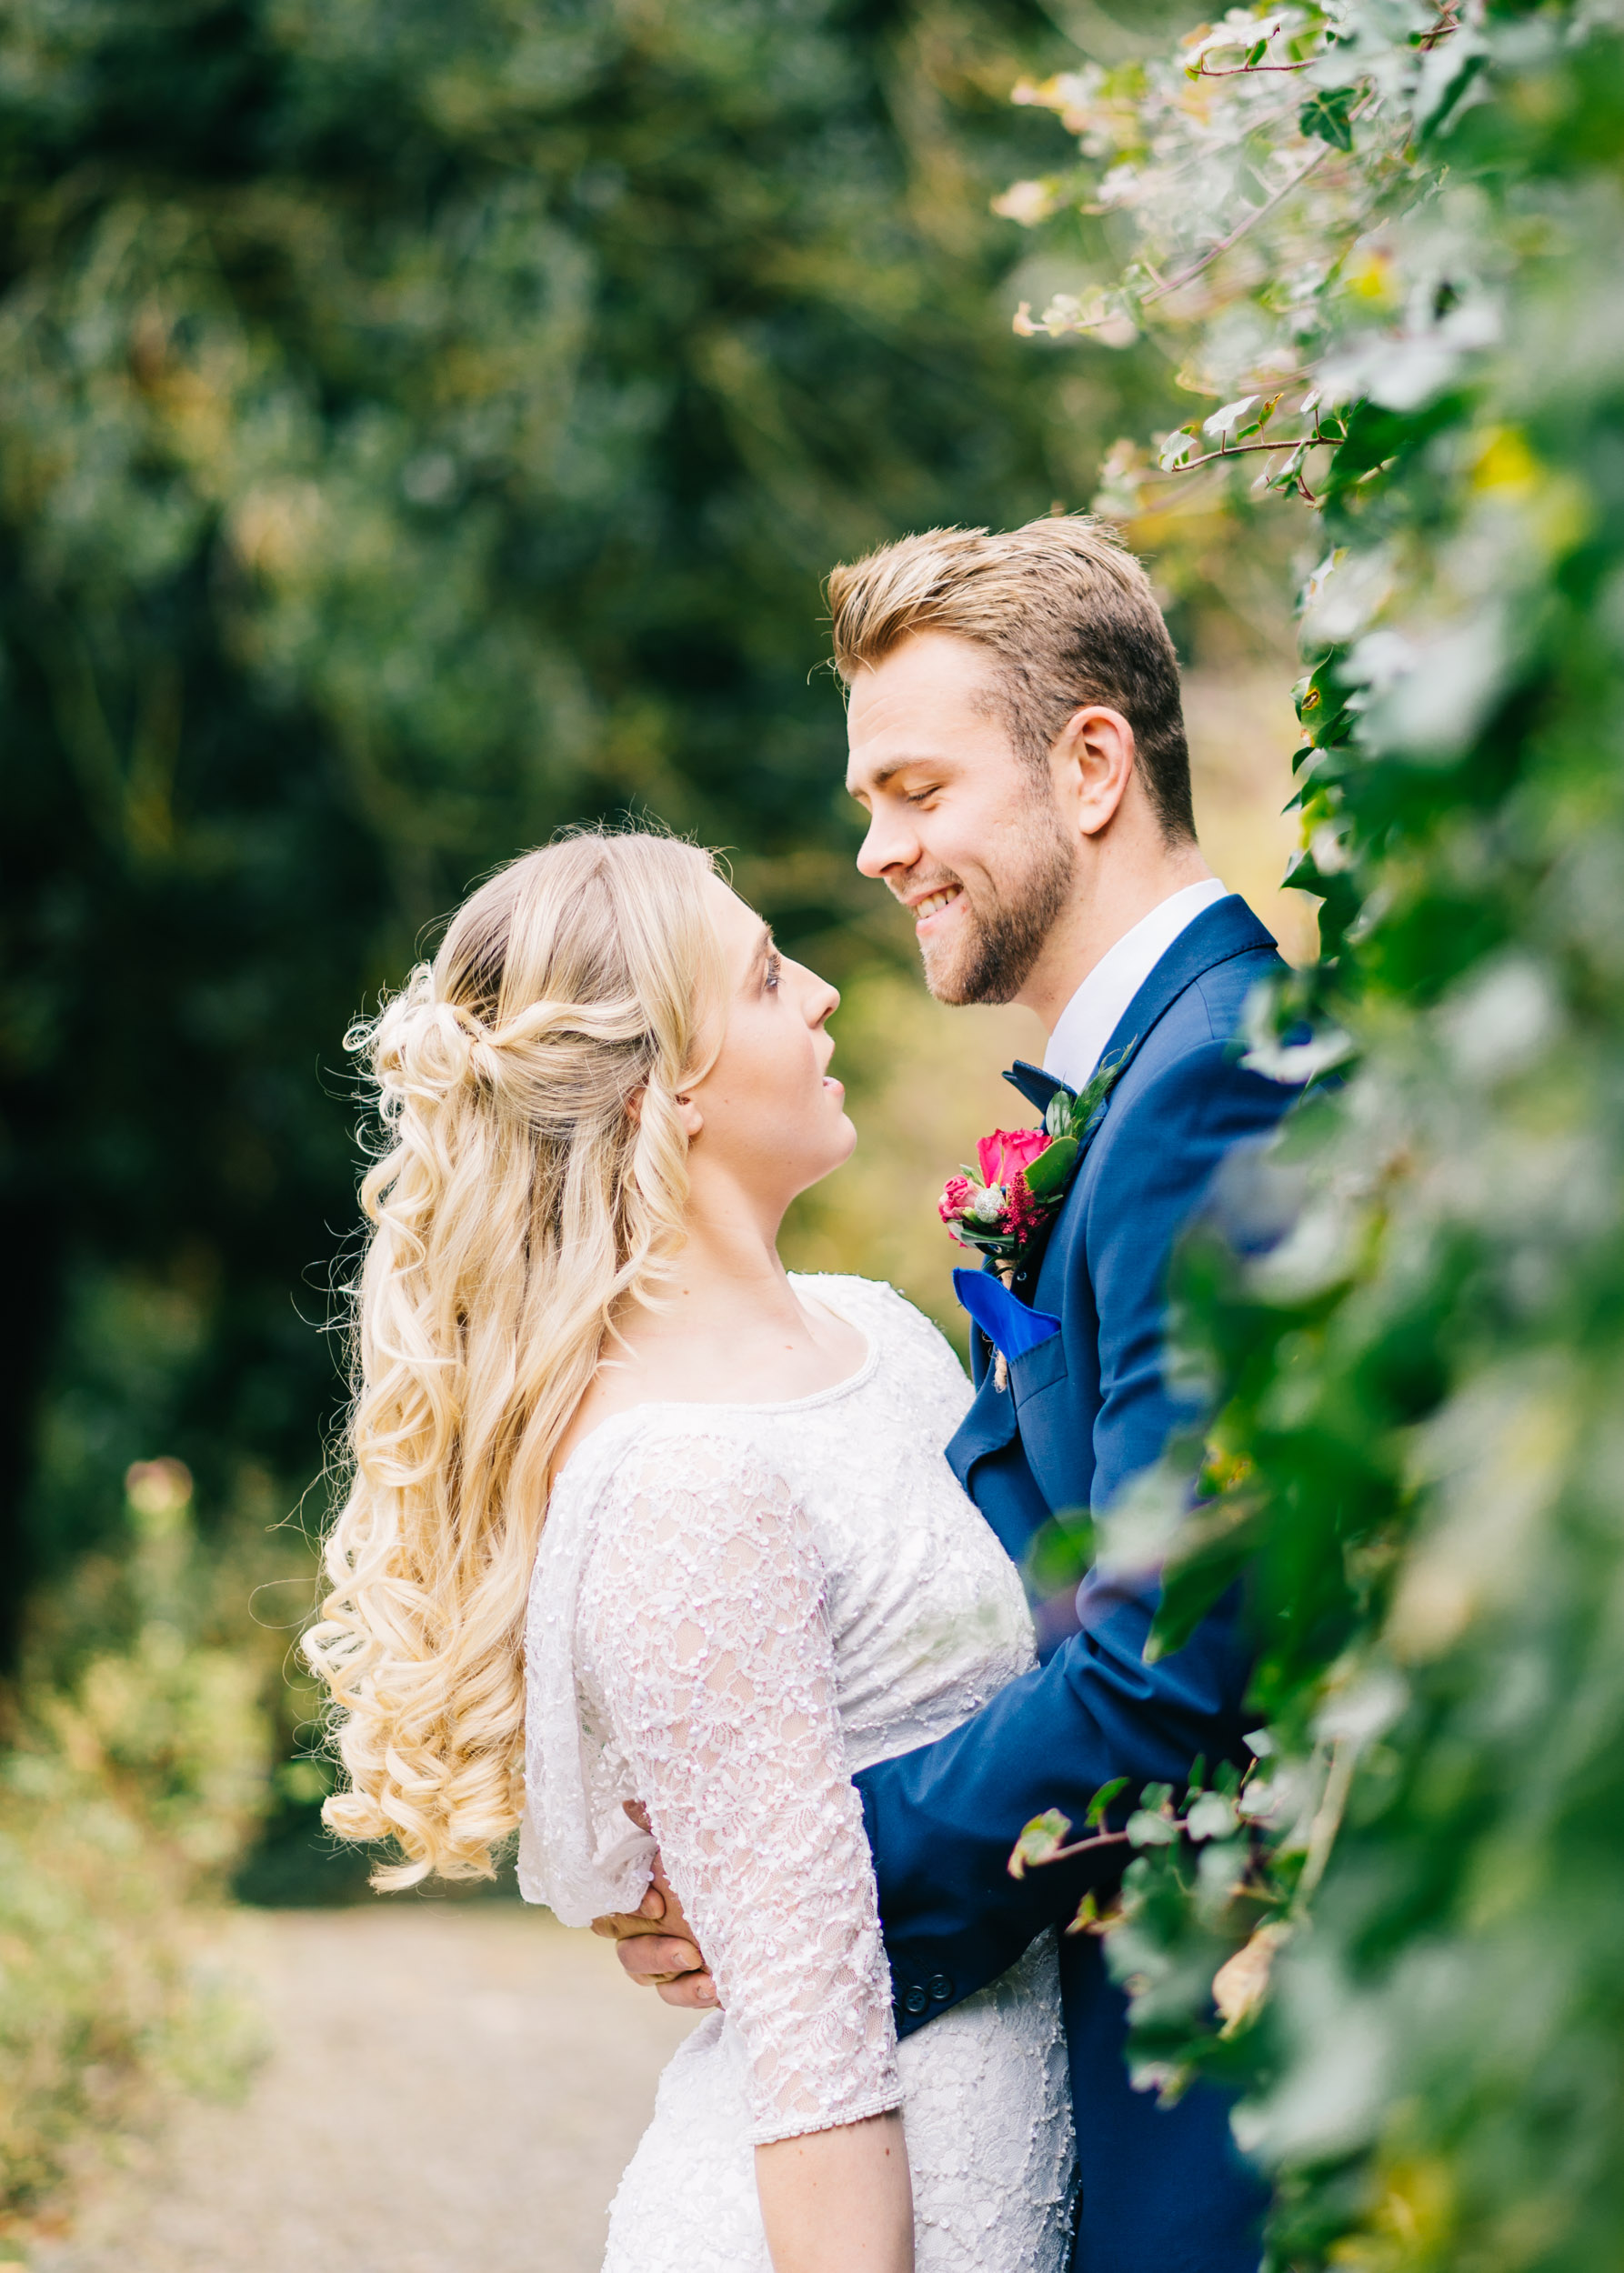 Mitton Hall Wedding Photography- Laura Duggleby Photographer6